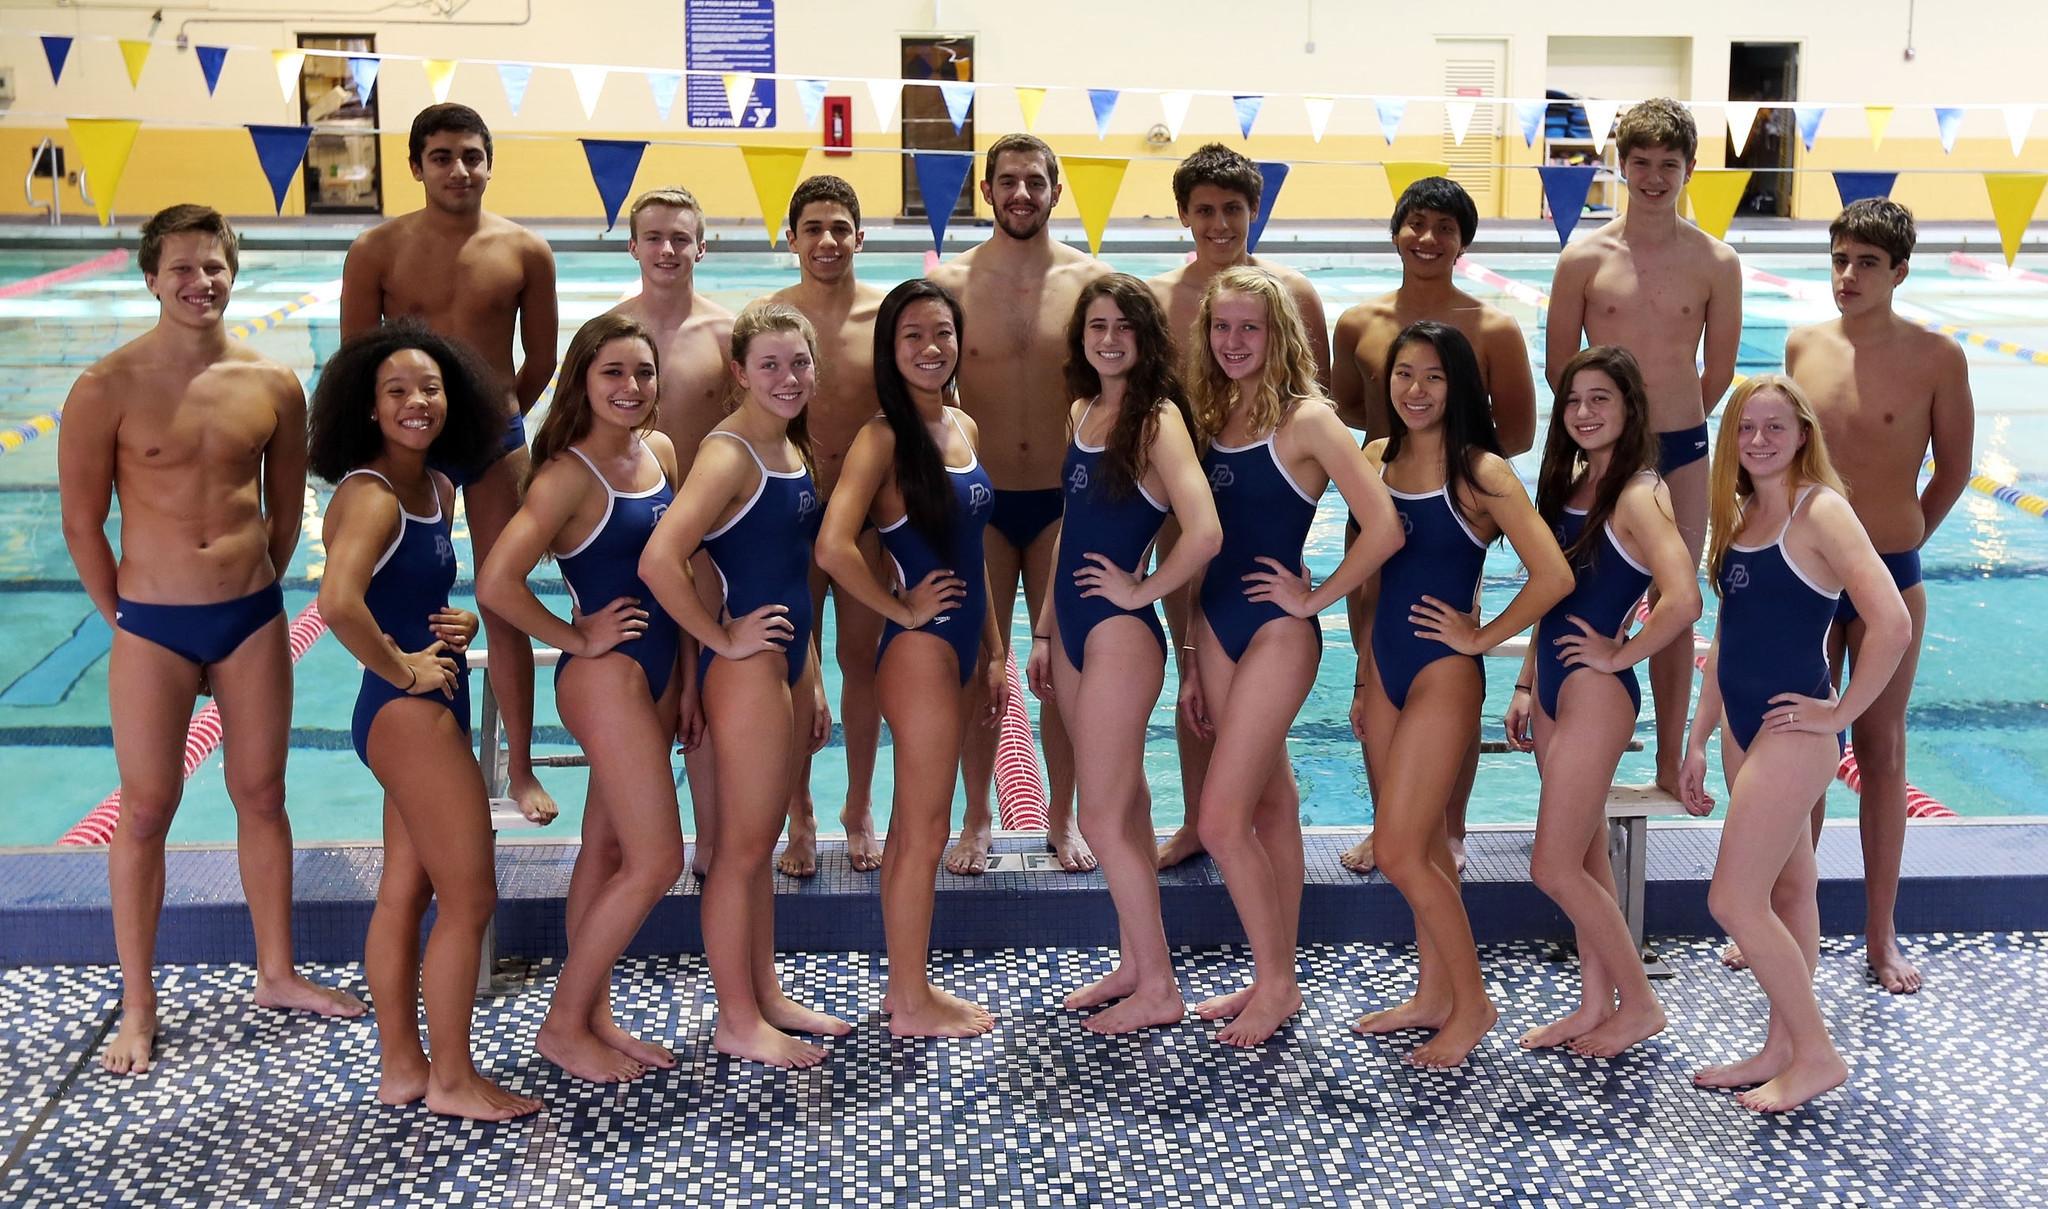 dr  phillips u0026 39  swim team will honor 12 on senior day